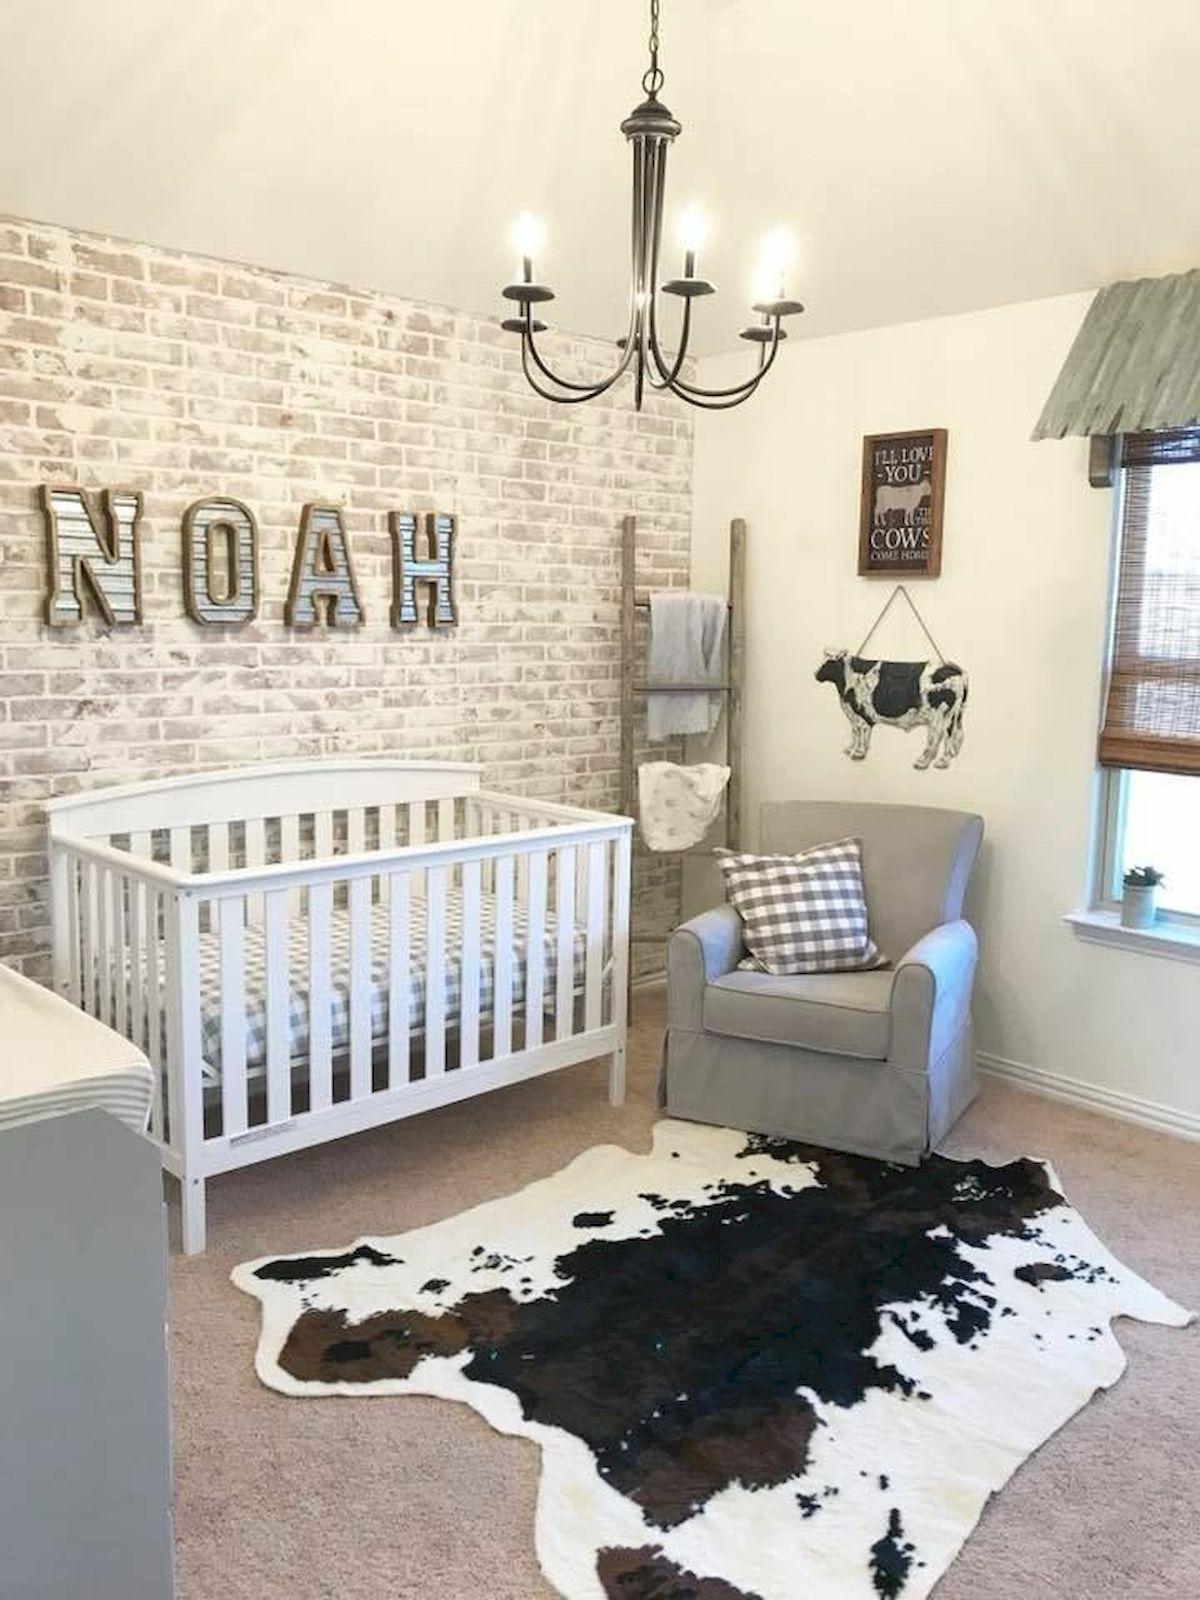 50 Cool Baby Nursery Ideas For Boys Baby Boy Room Nursery